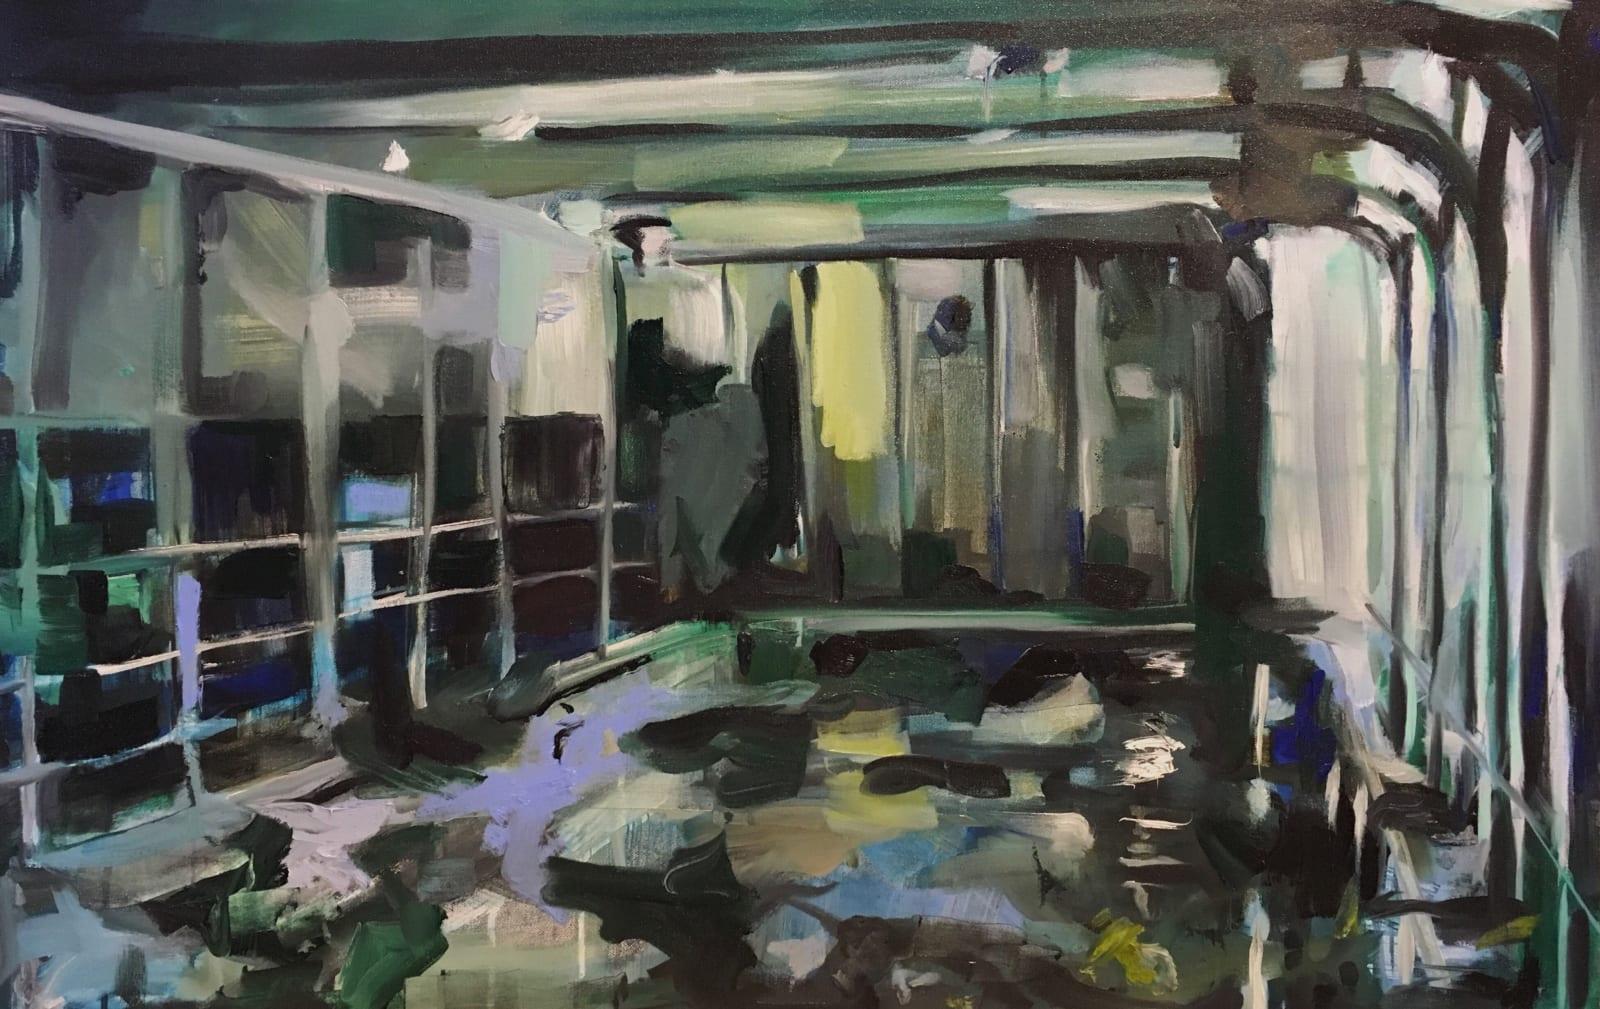 Elizabeth Schwaiger, Unsinkable, 2016